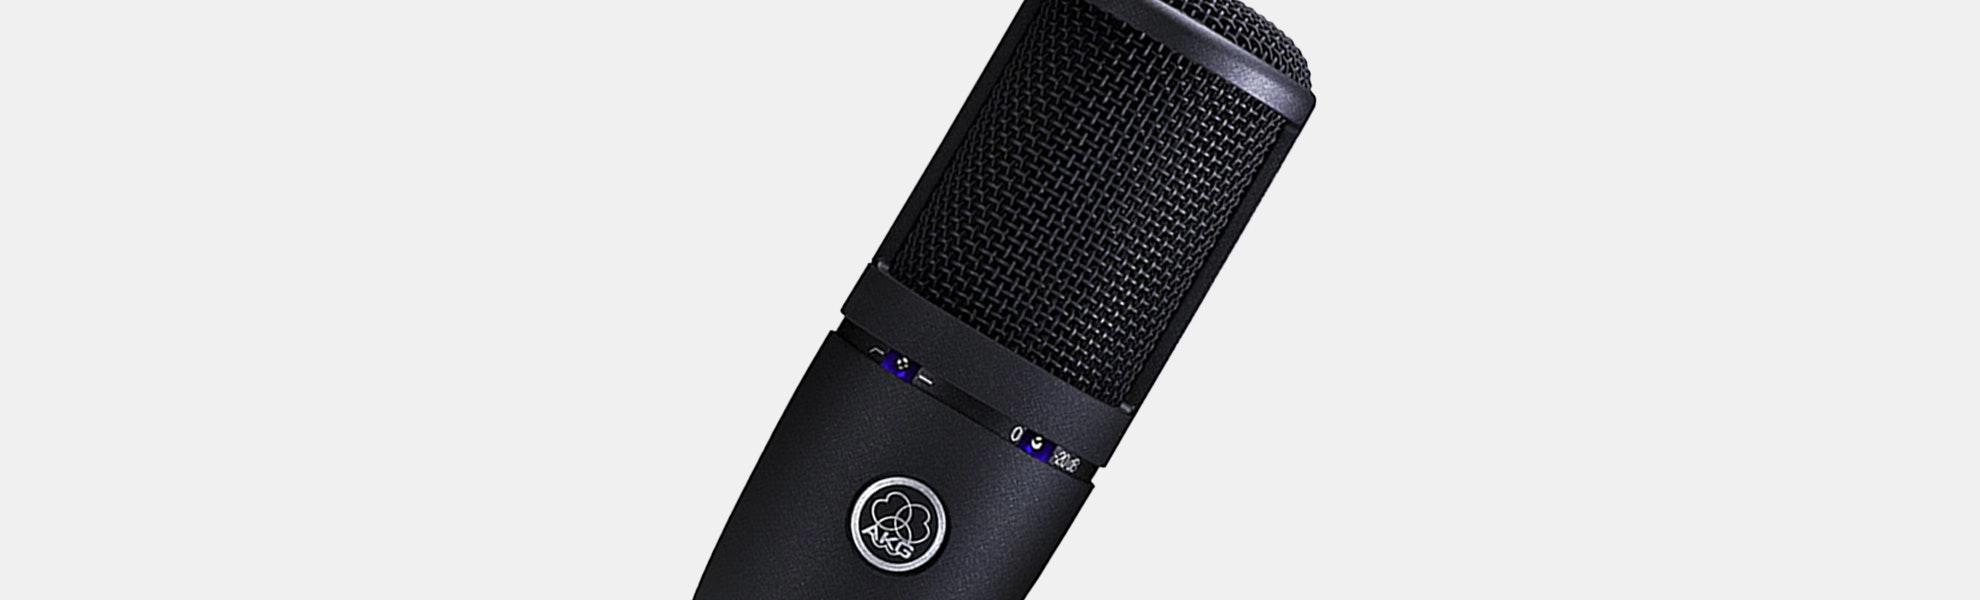 AKG P120 USB Condenser Microphone